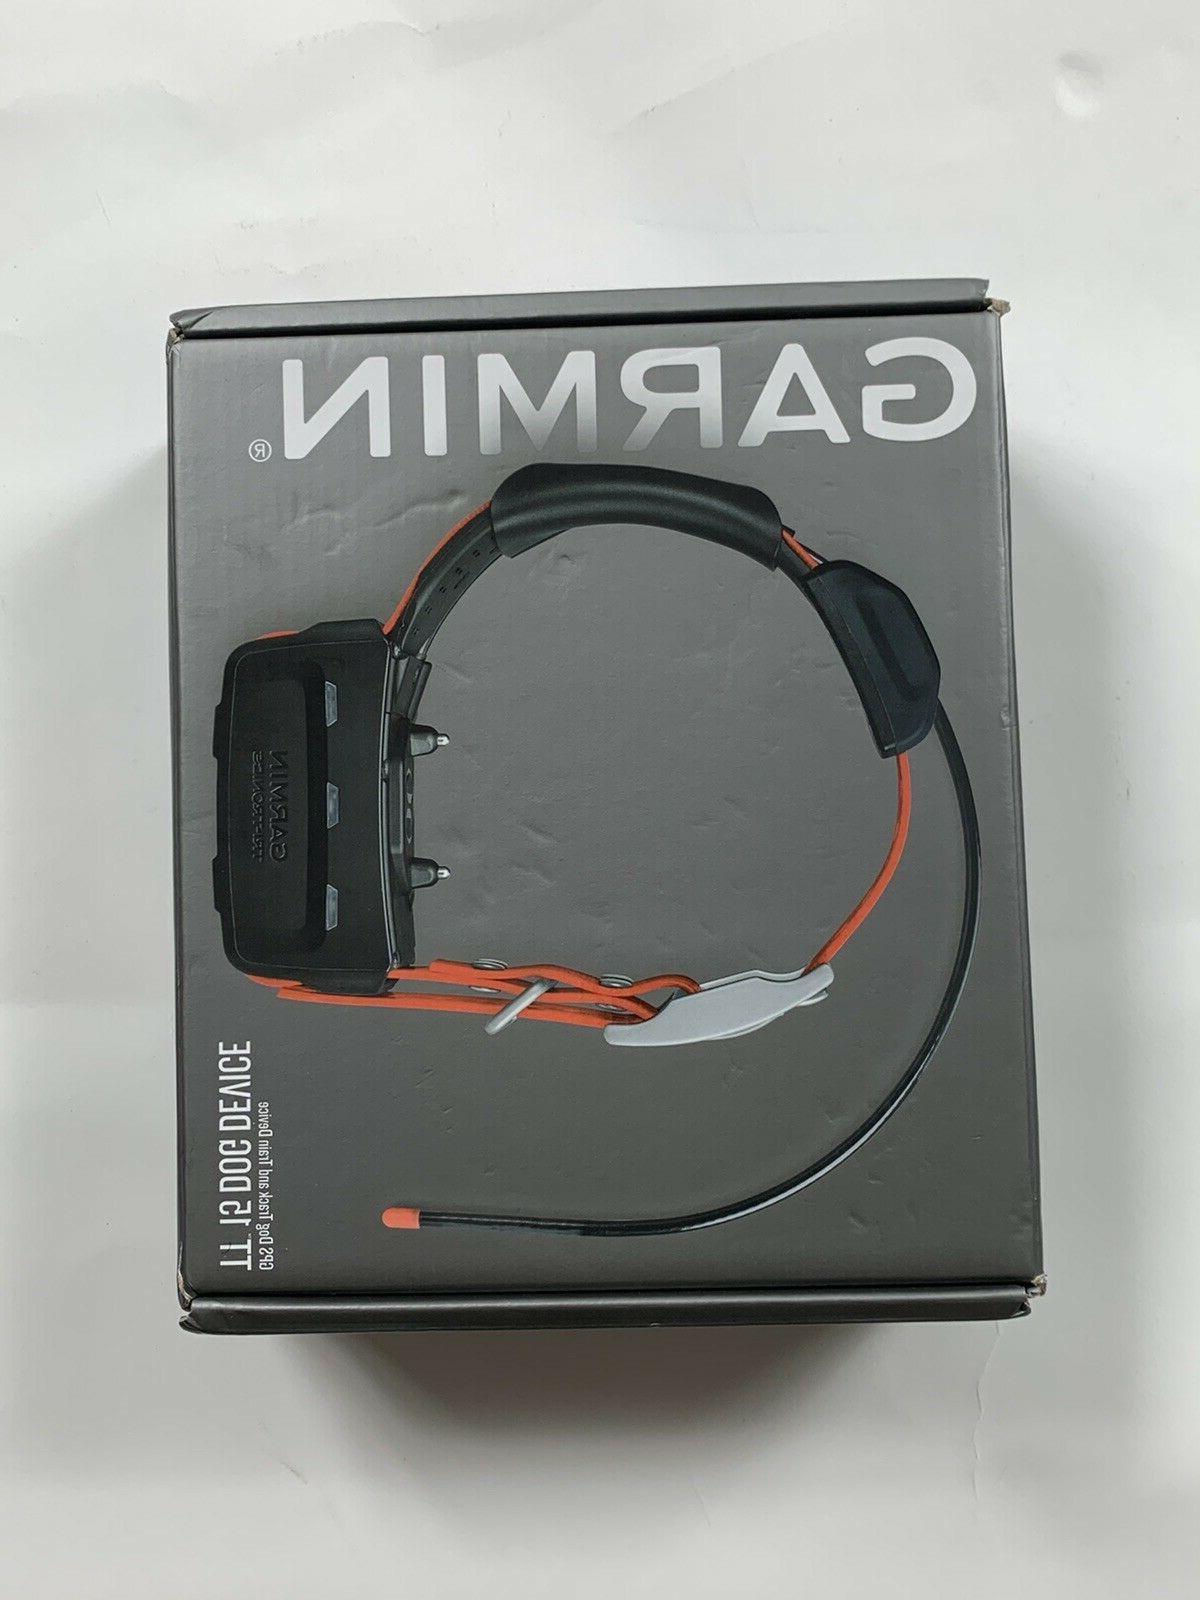 Garmin 15 GPS Mini Tracking Training Collar- Worn Device